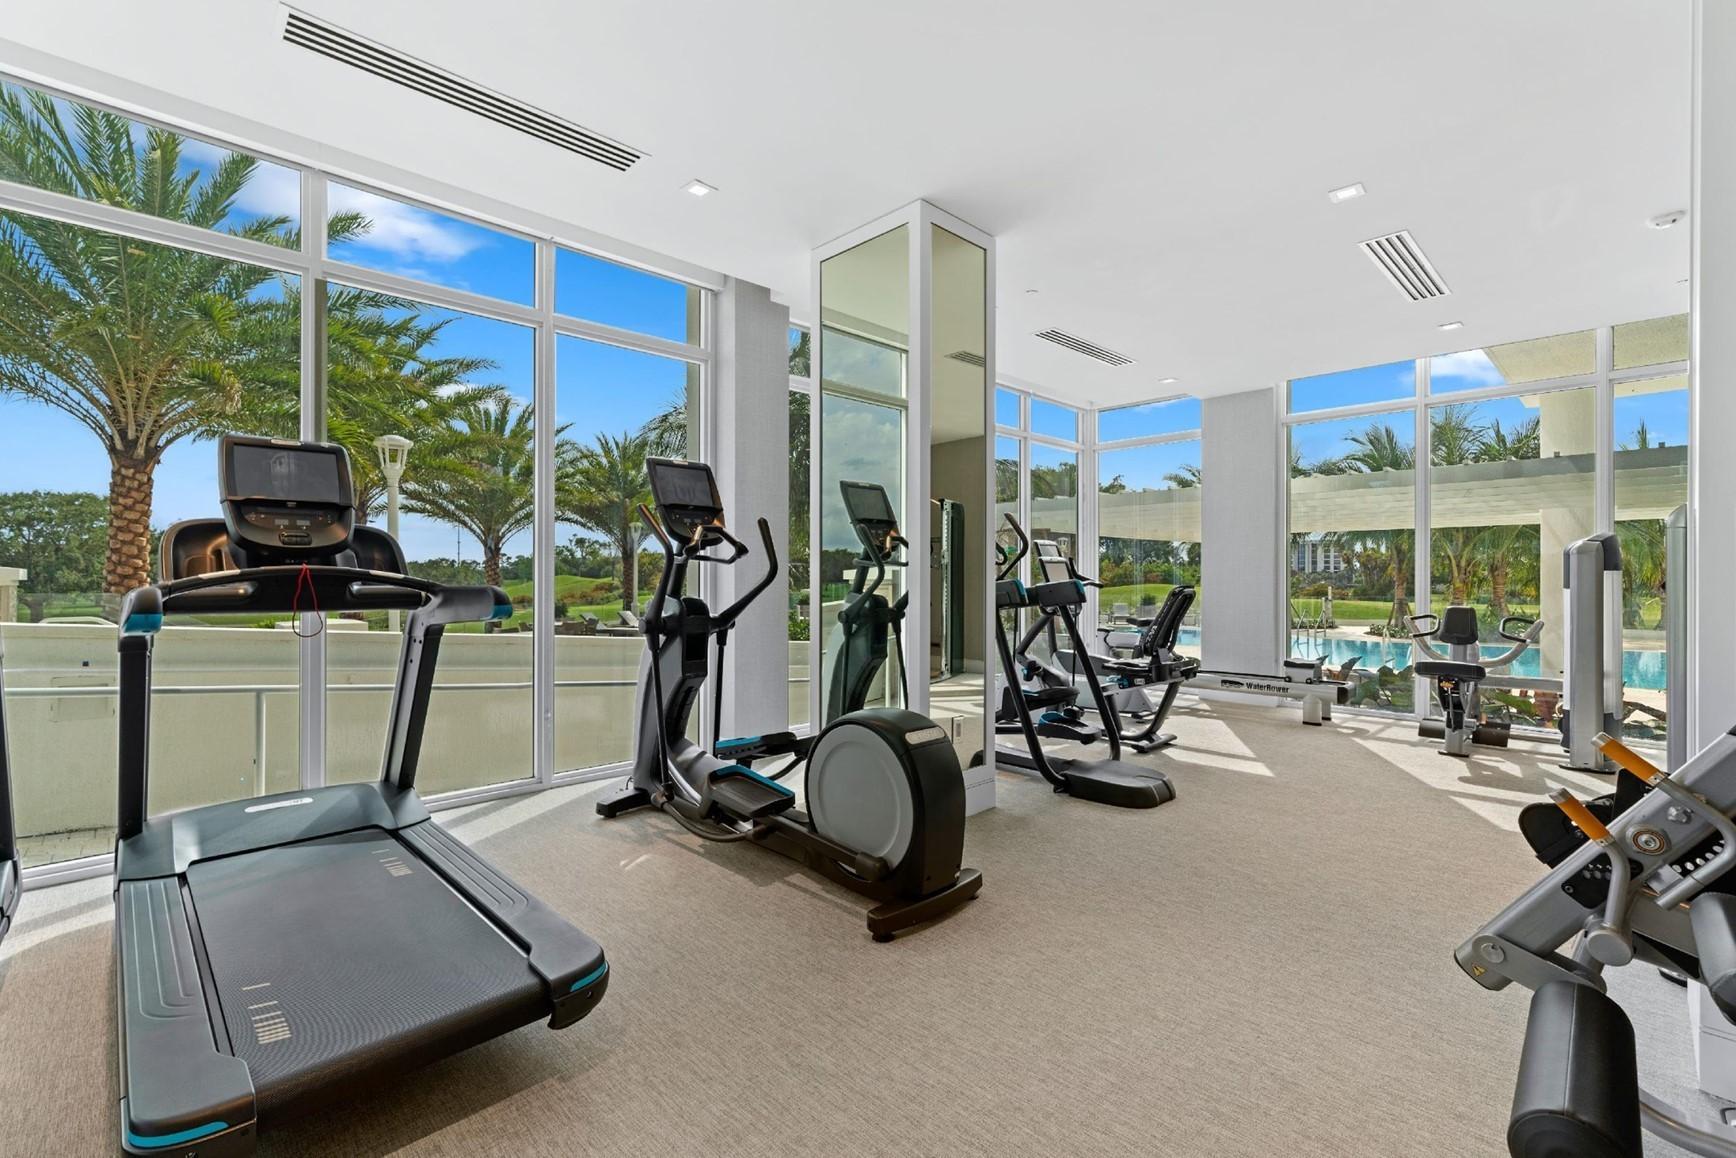 fitness center pic